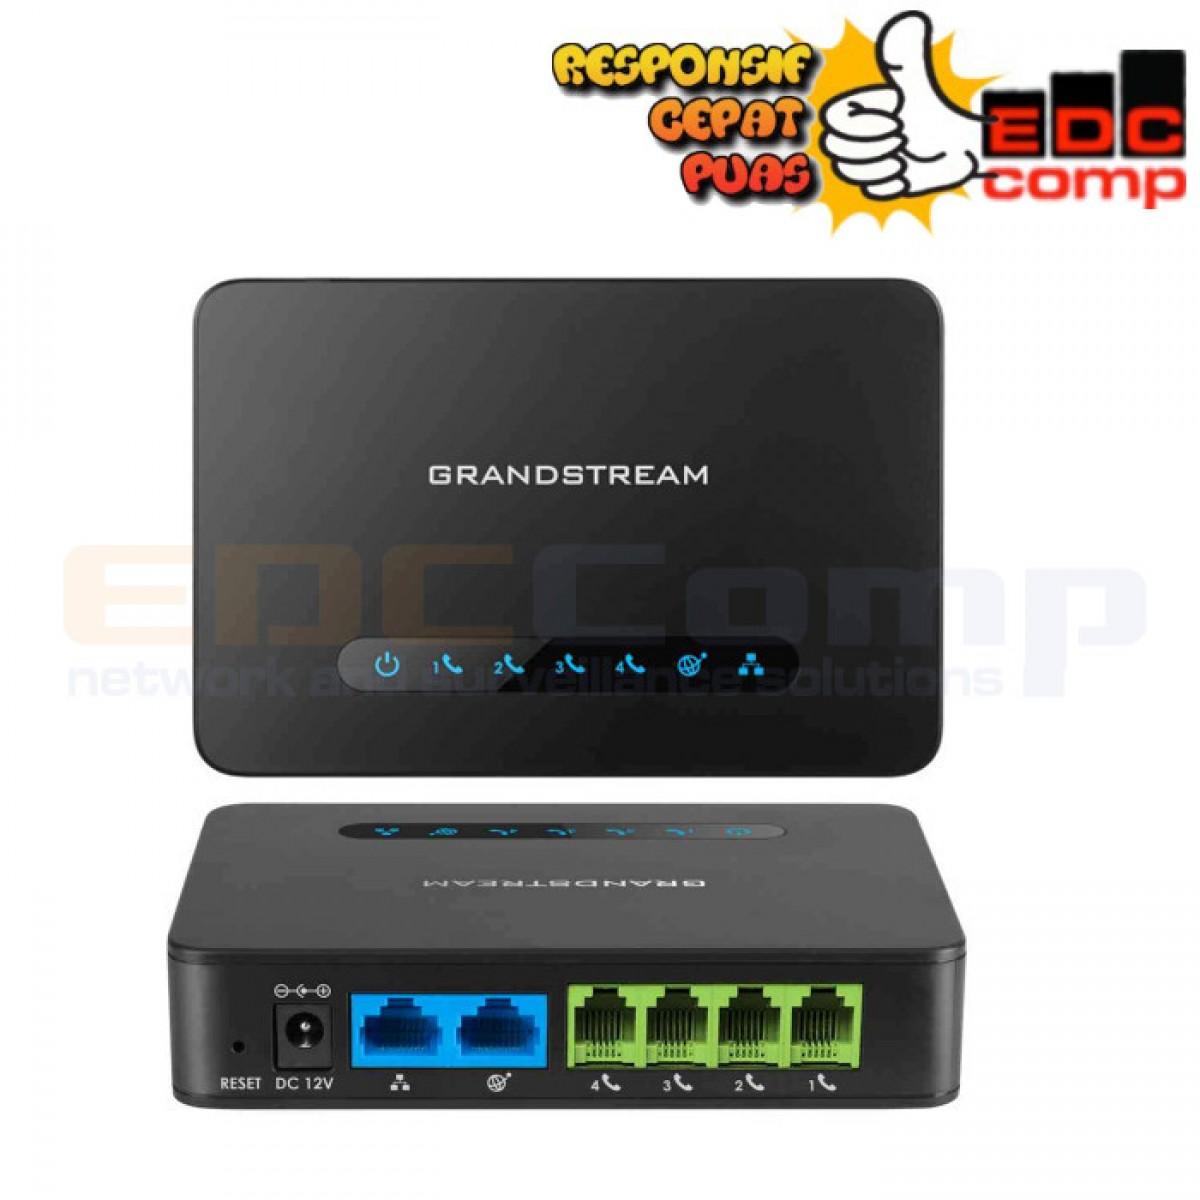 Grandstream HT814 Voip Gateway - HT814 VOIP Gateway Grandstream - EdcComp